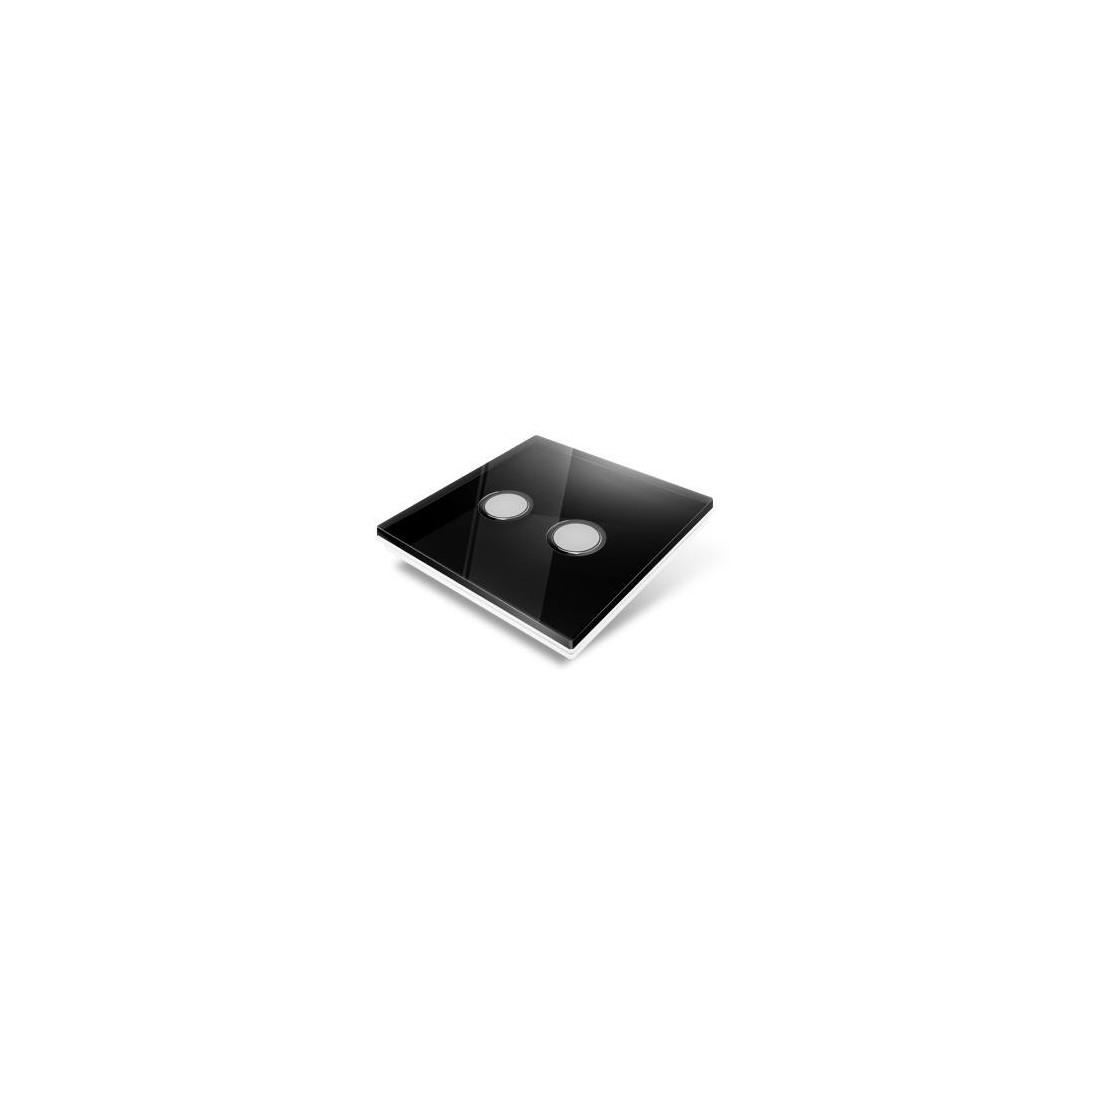 Cubierta para interruptor Edisio - crystal negro